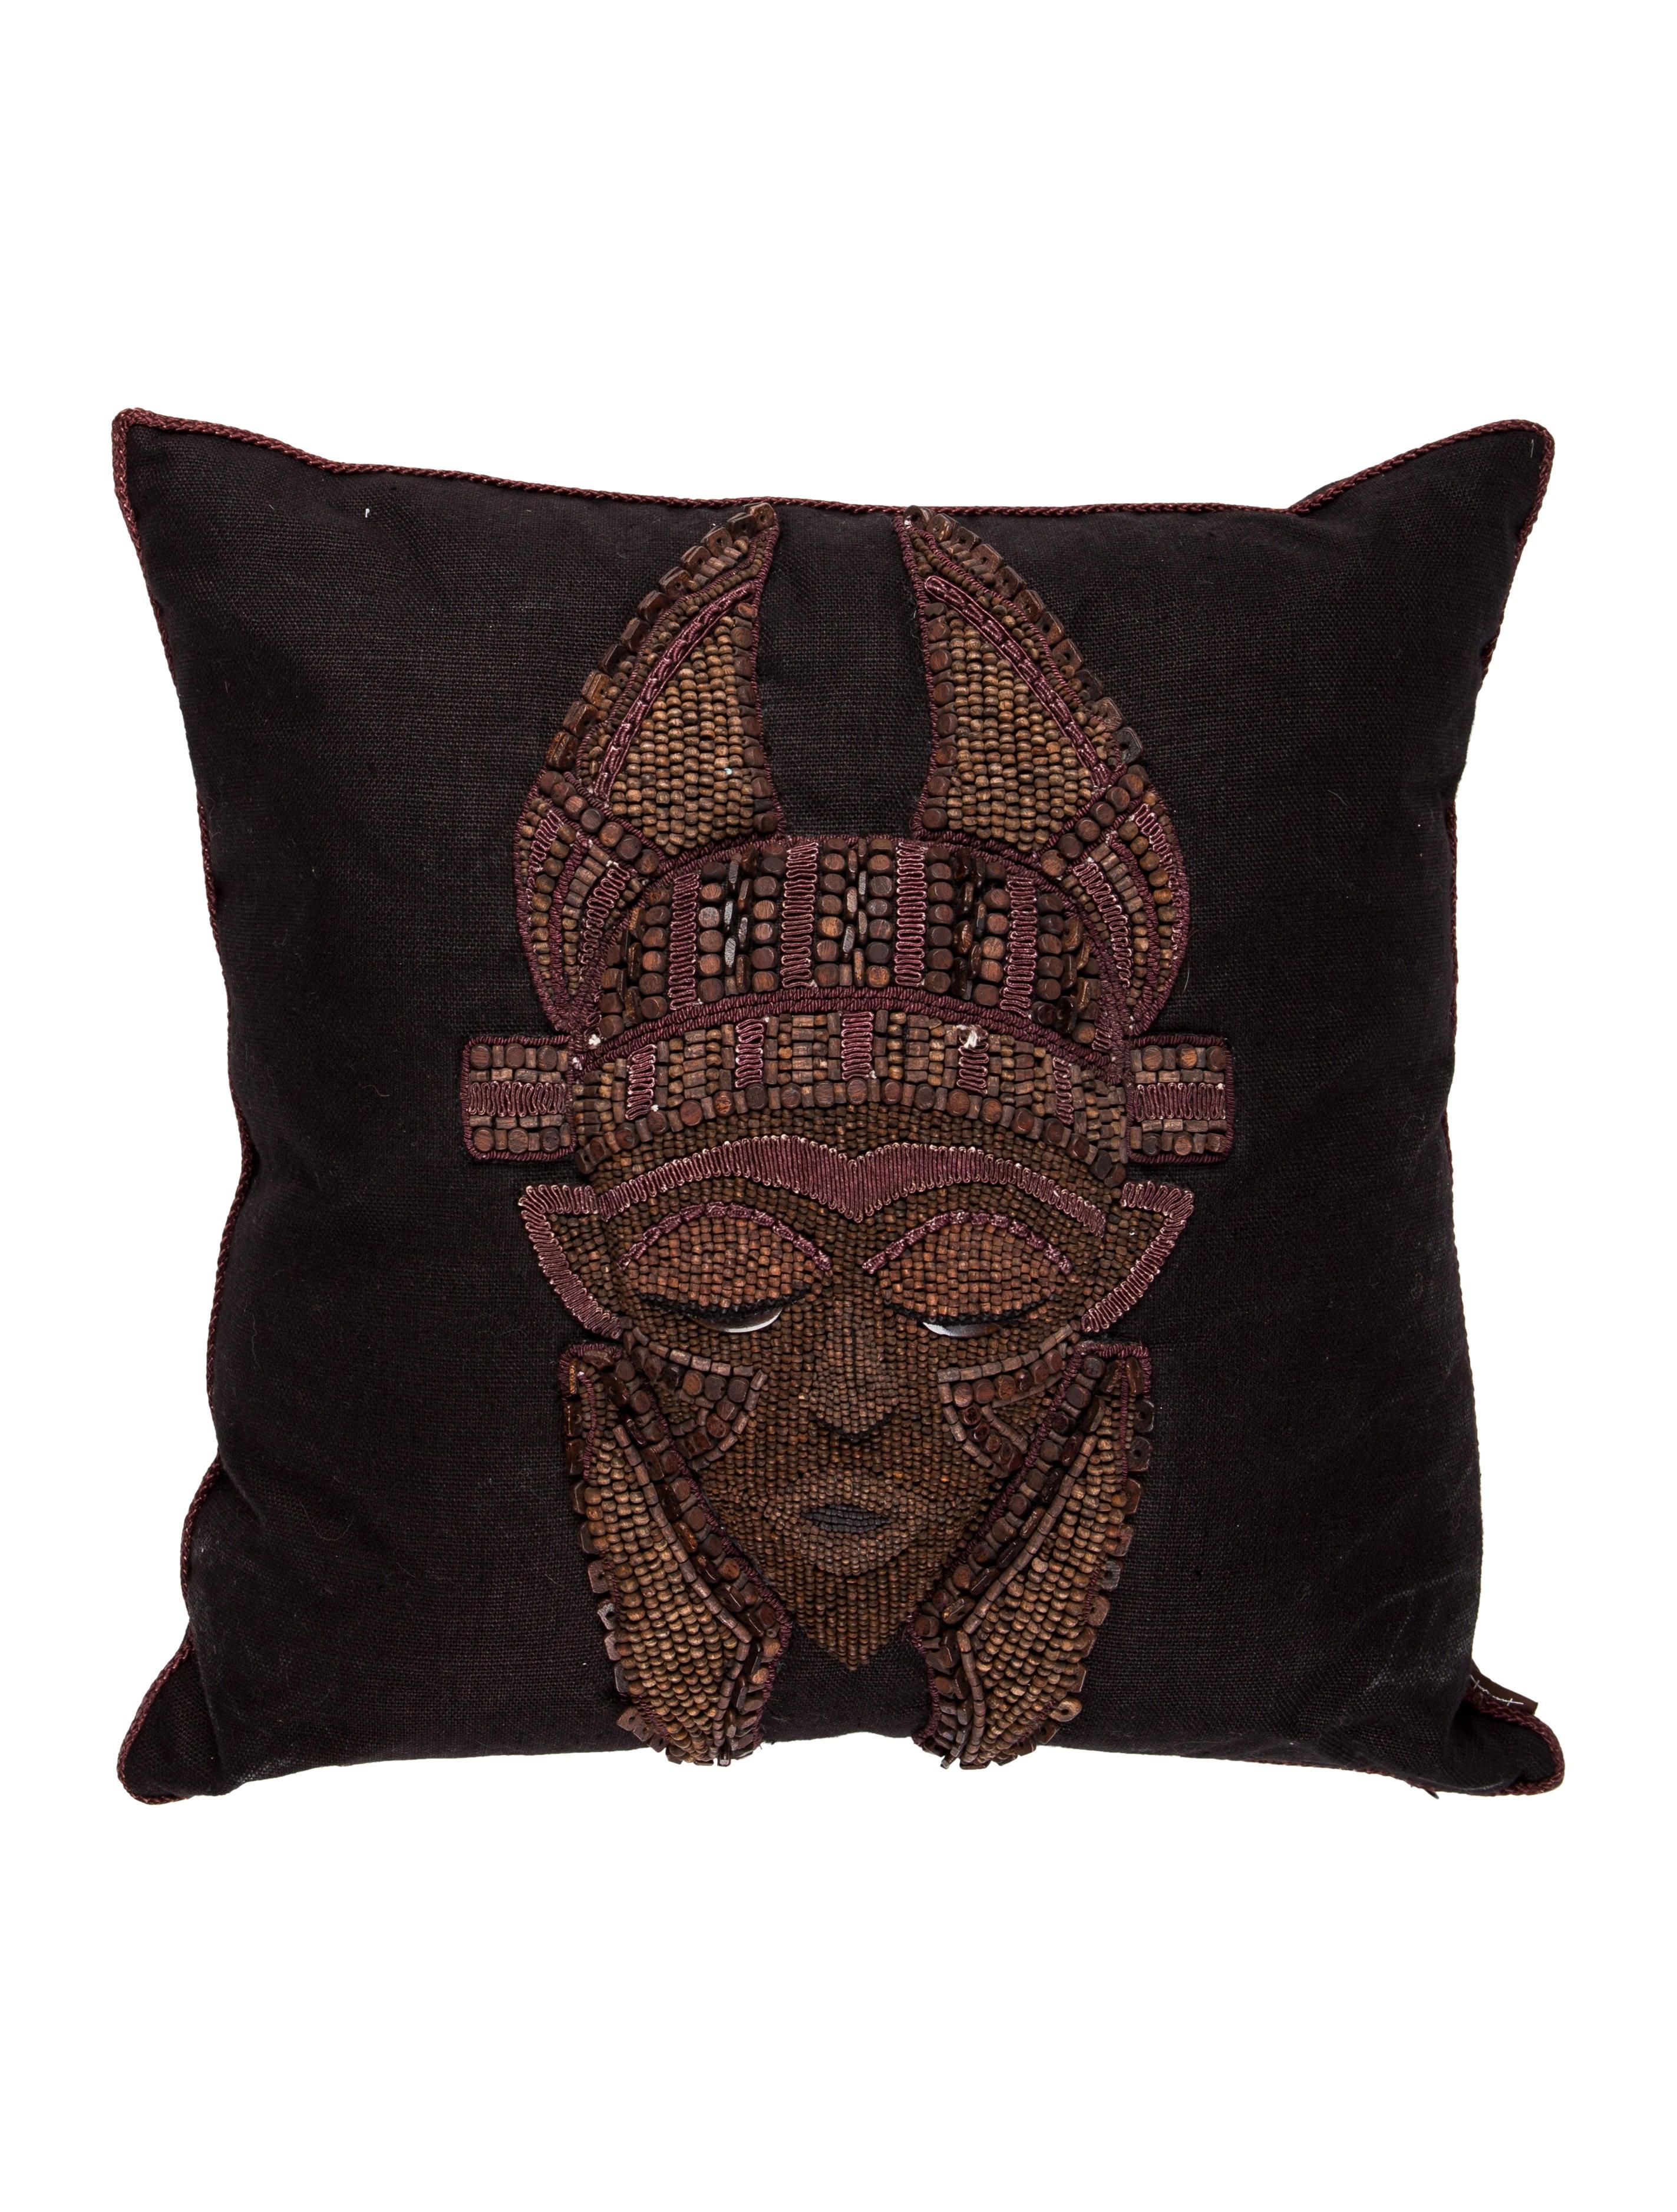 Decorative Pillows With Beading : Ankasa Beaded Mask Throw Pillow - Pillows And Throws - ANKSA20031 The RealReal